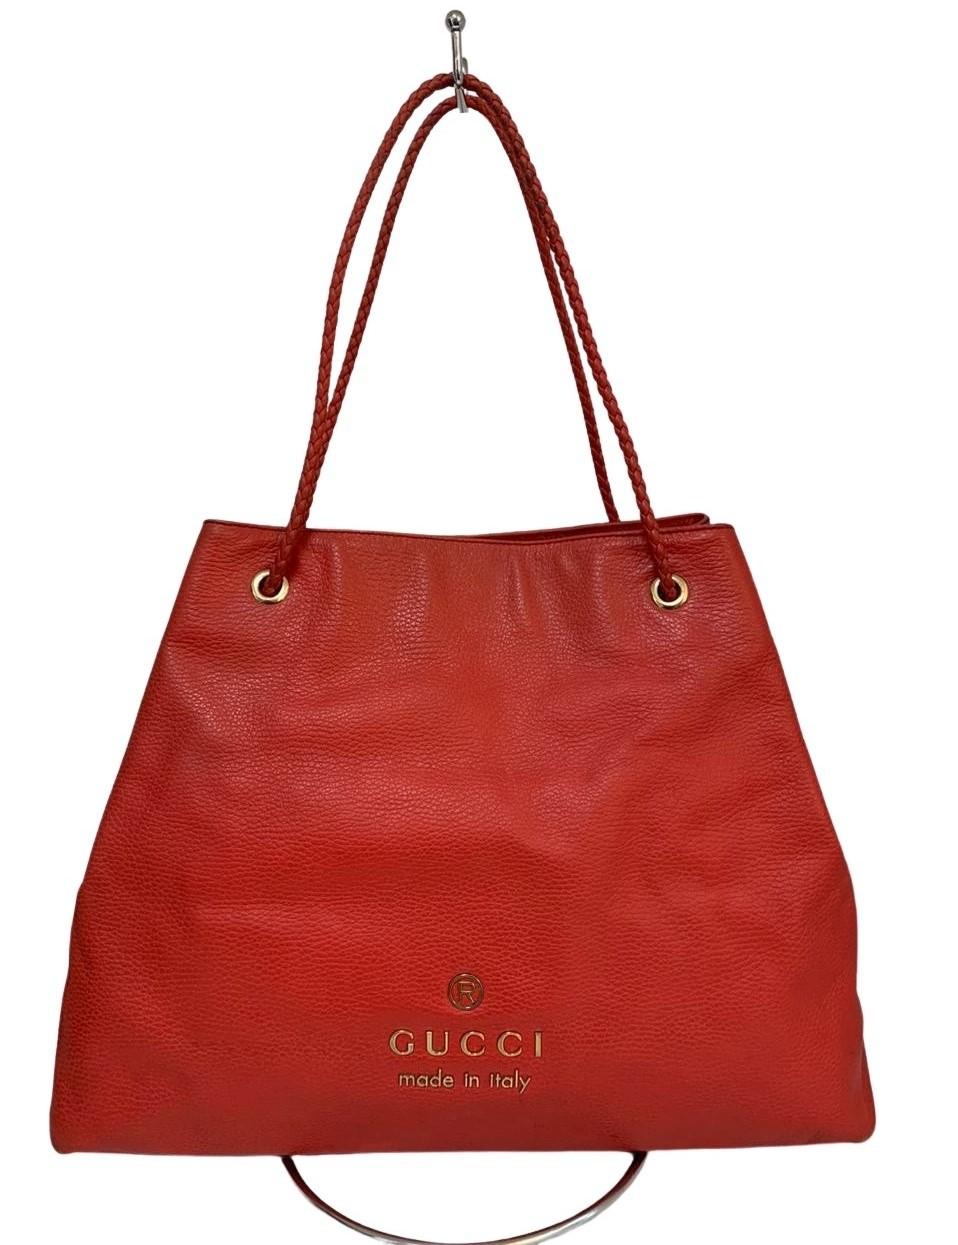 Bolsa Gucci Gifford Vermelha